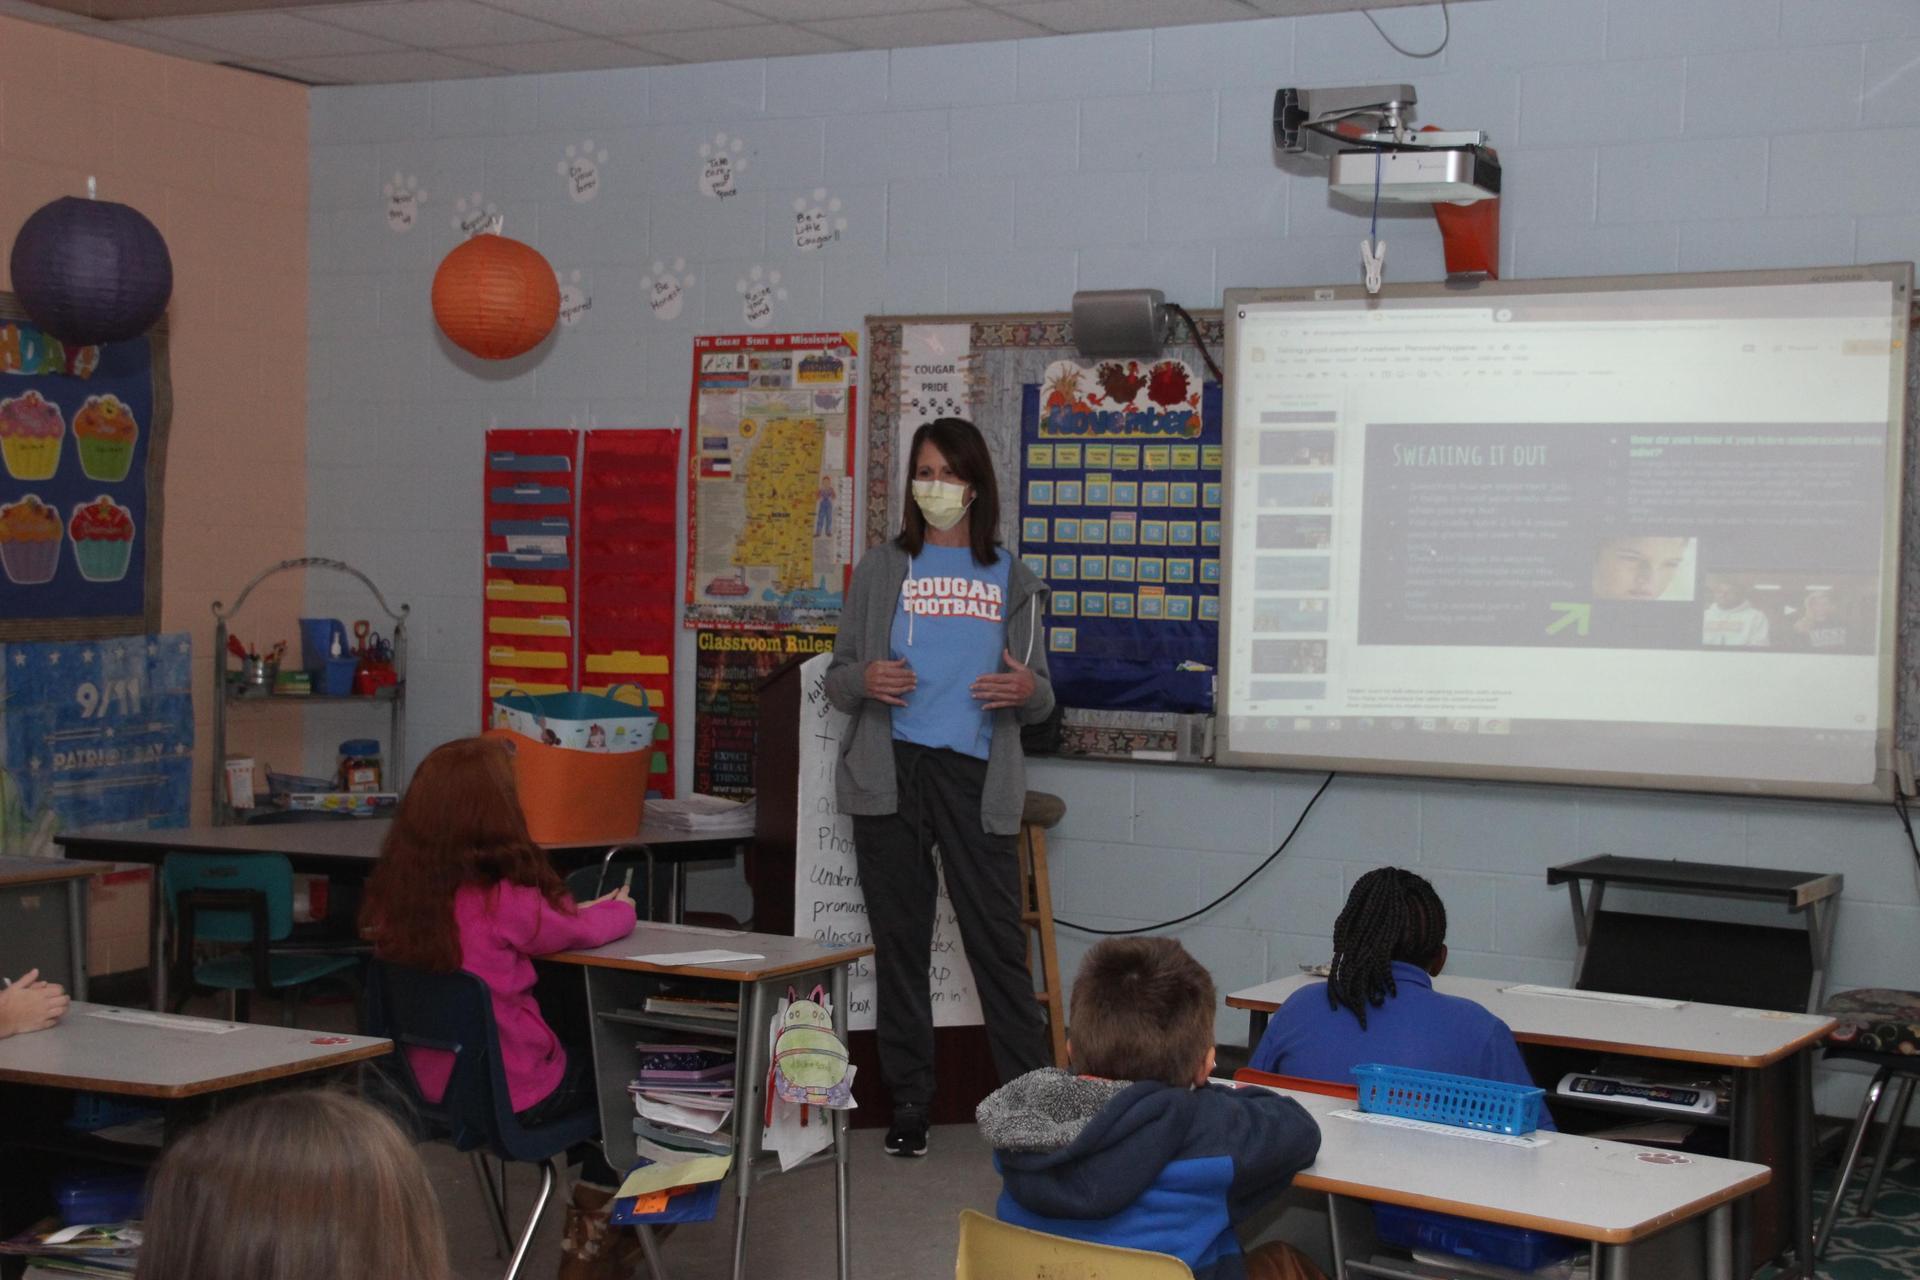 Nurse Speaks to Students on Proper Hygiene